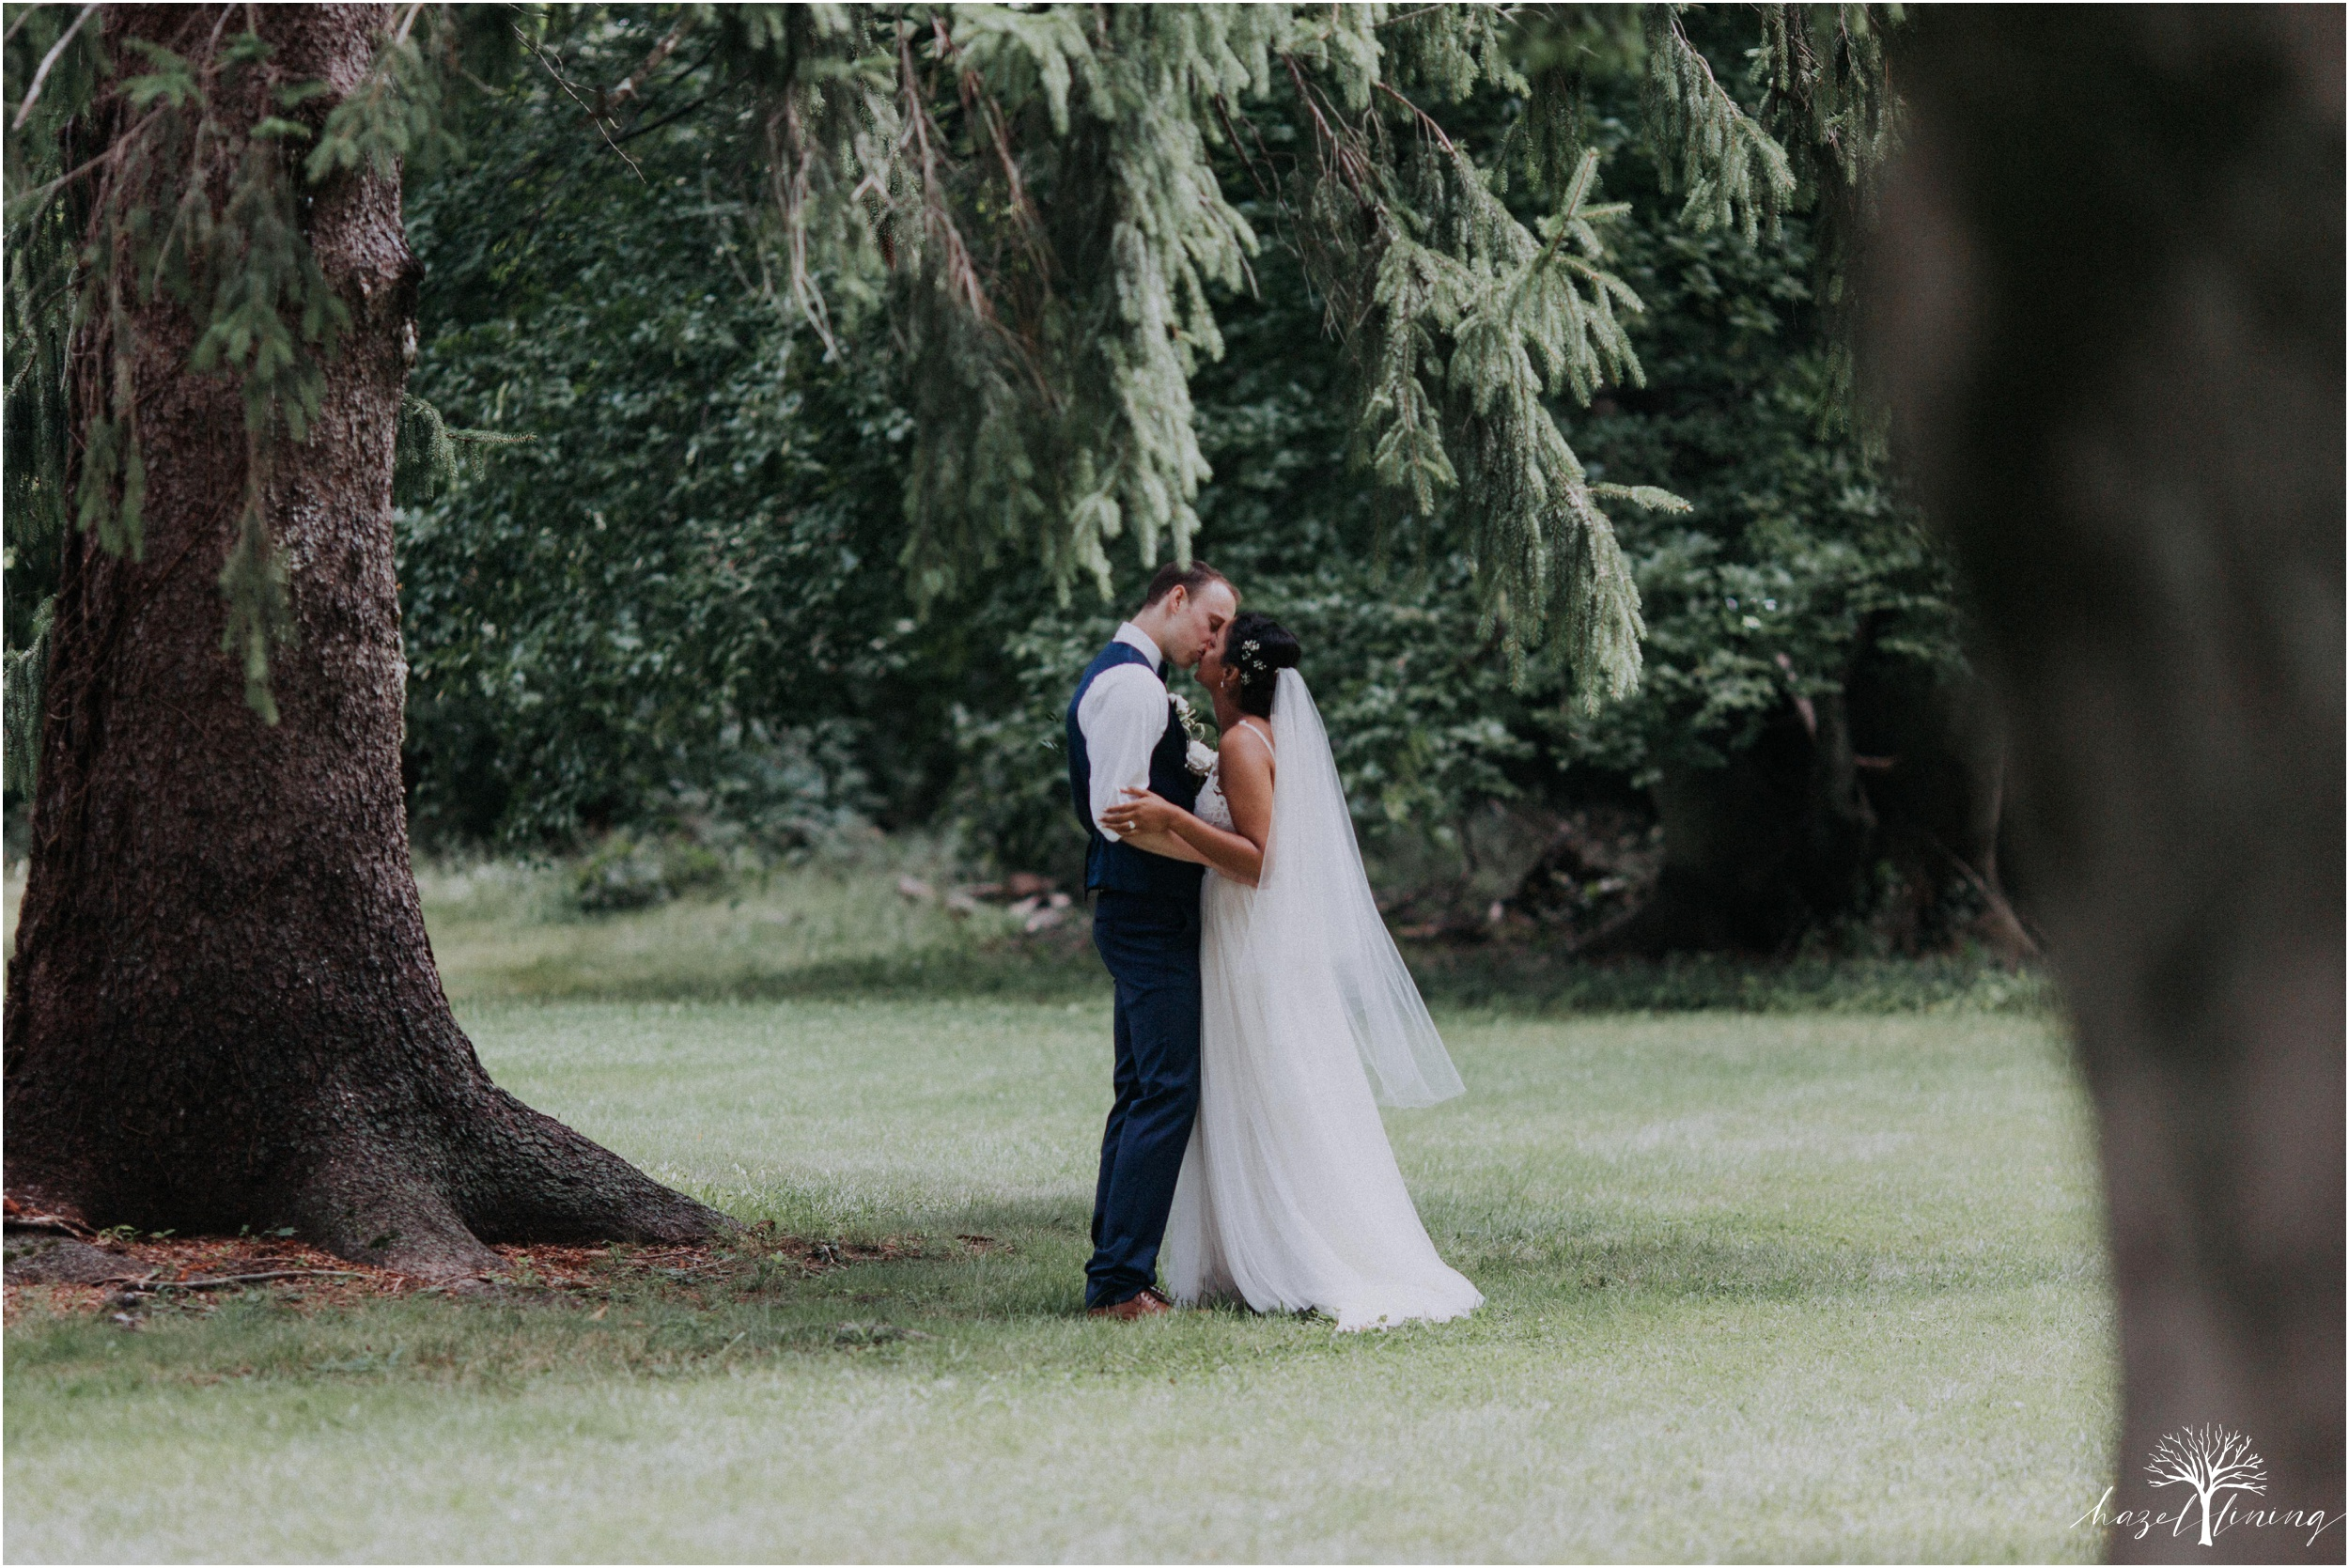 mariah-kreyling-samuel-sherratt-sherrattwiththeworld-peirce-farm-at-witch-hill-boston-massachusetts-wedding-photography-hazel-lining-travel-wedding-elopement-photography_0104.jpg